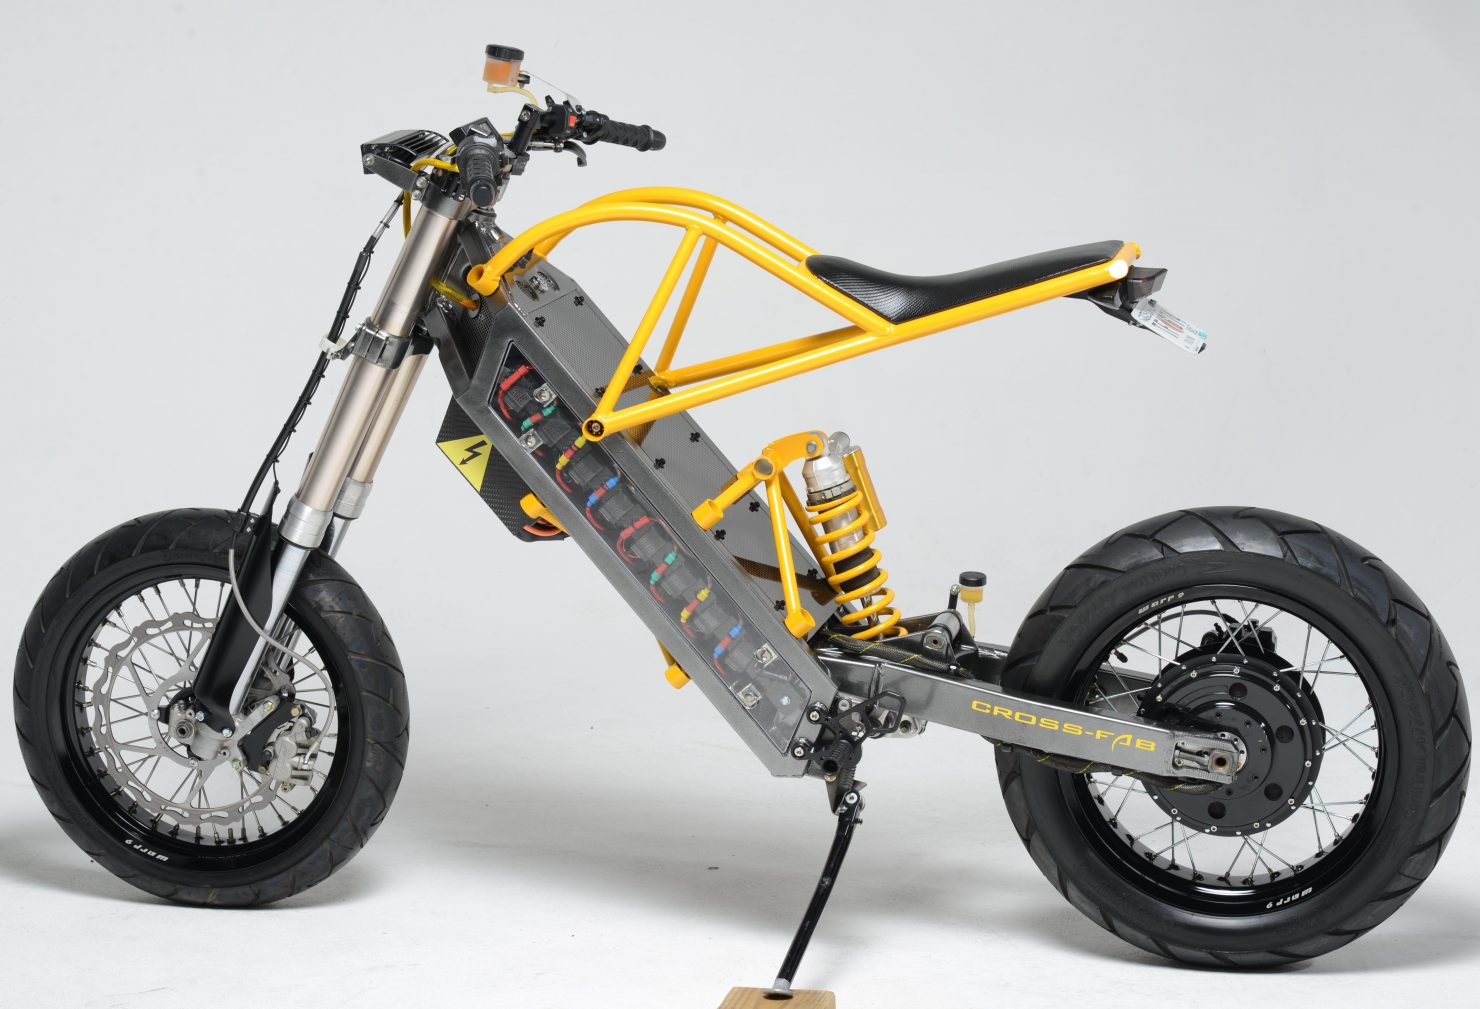 ExoDyne Electric Motorcycle 11 1480x1009 - ExoDyne Electric Motorcycle